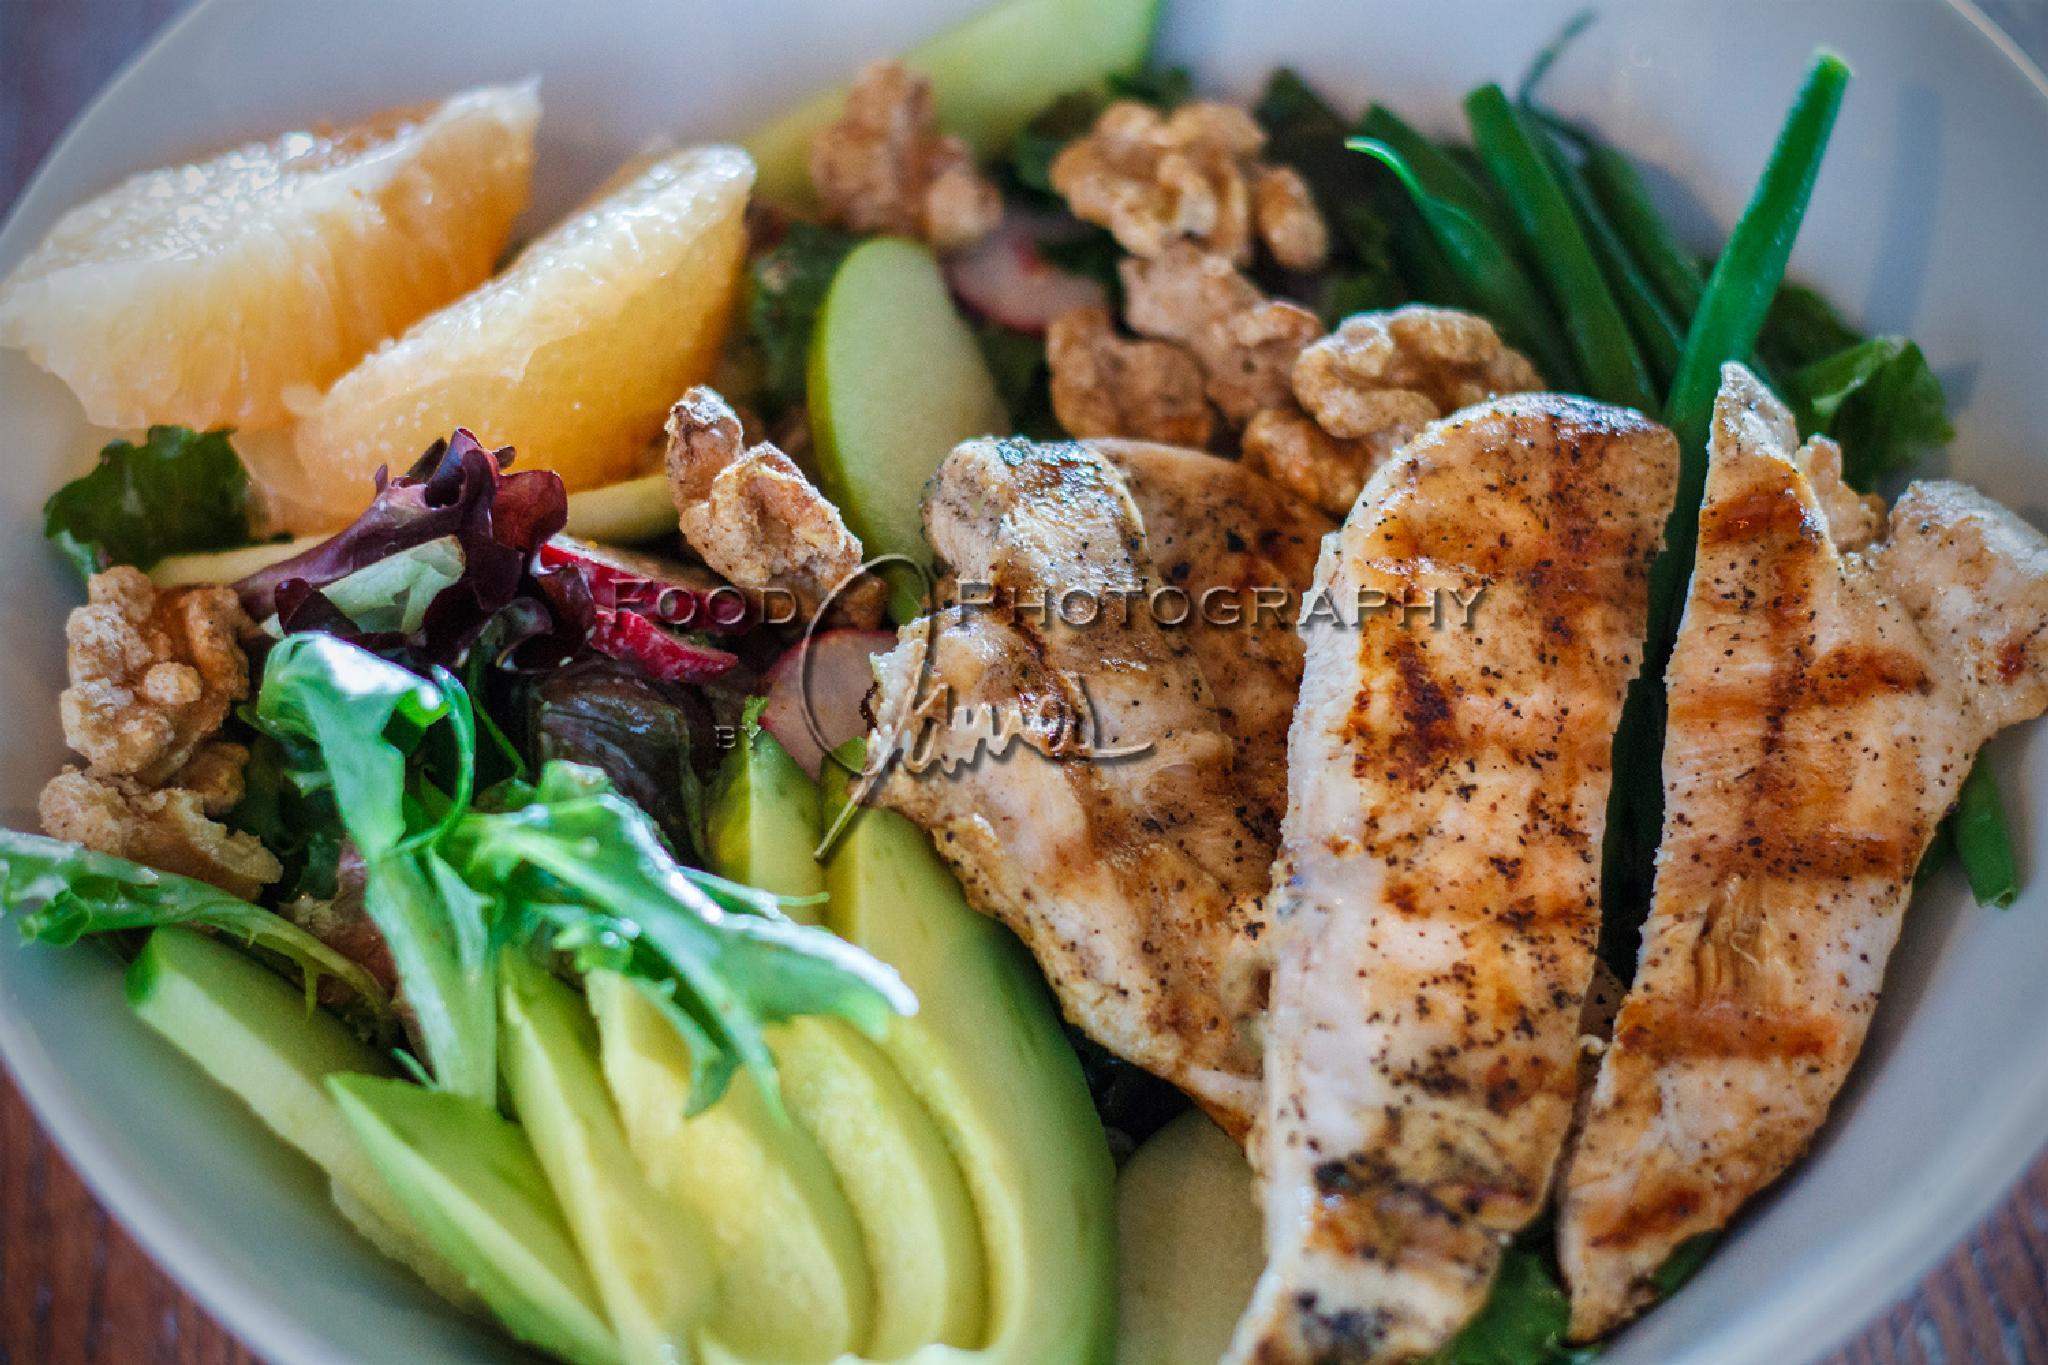 Grilled Chicken, Avocado, & Grapefruit-Salad by James Stefiuk